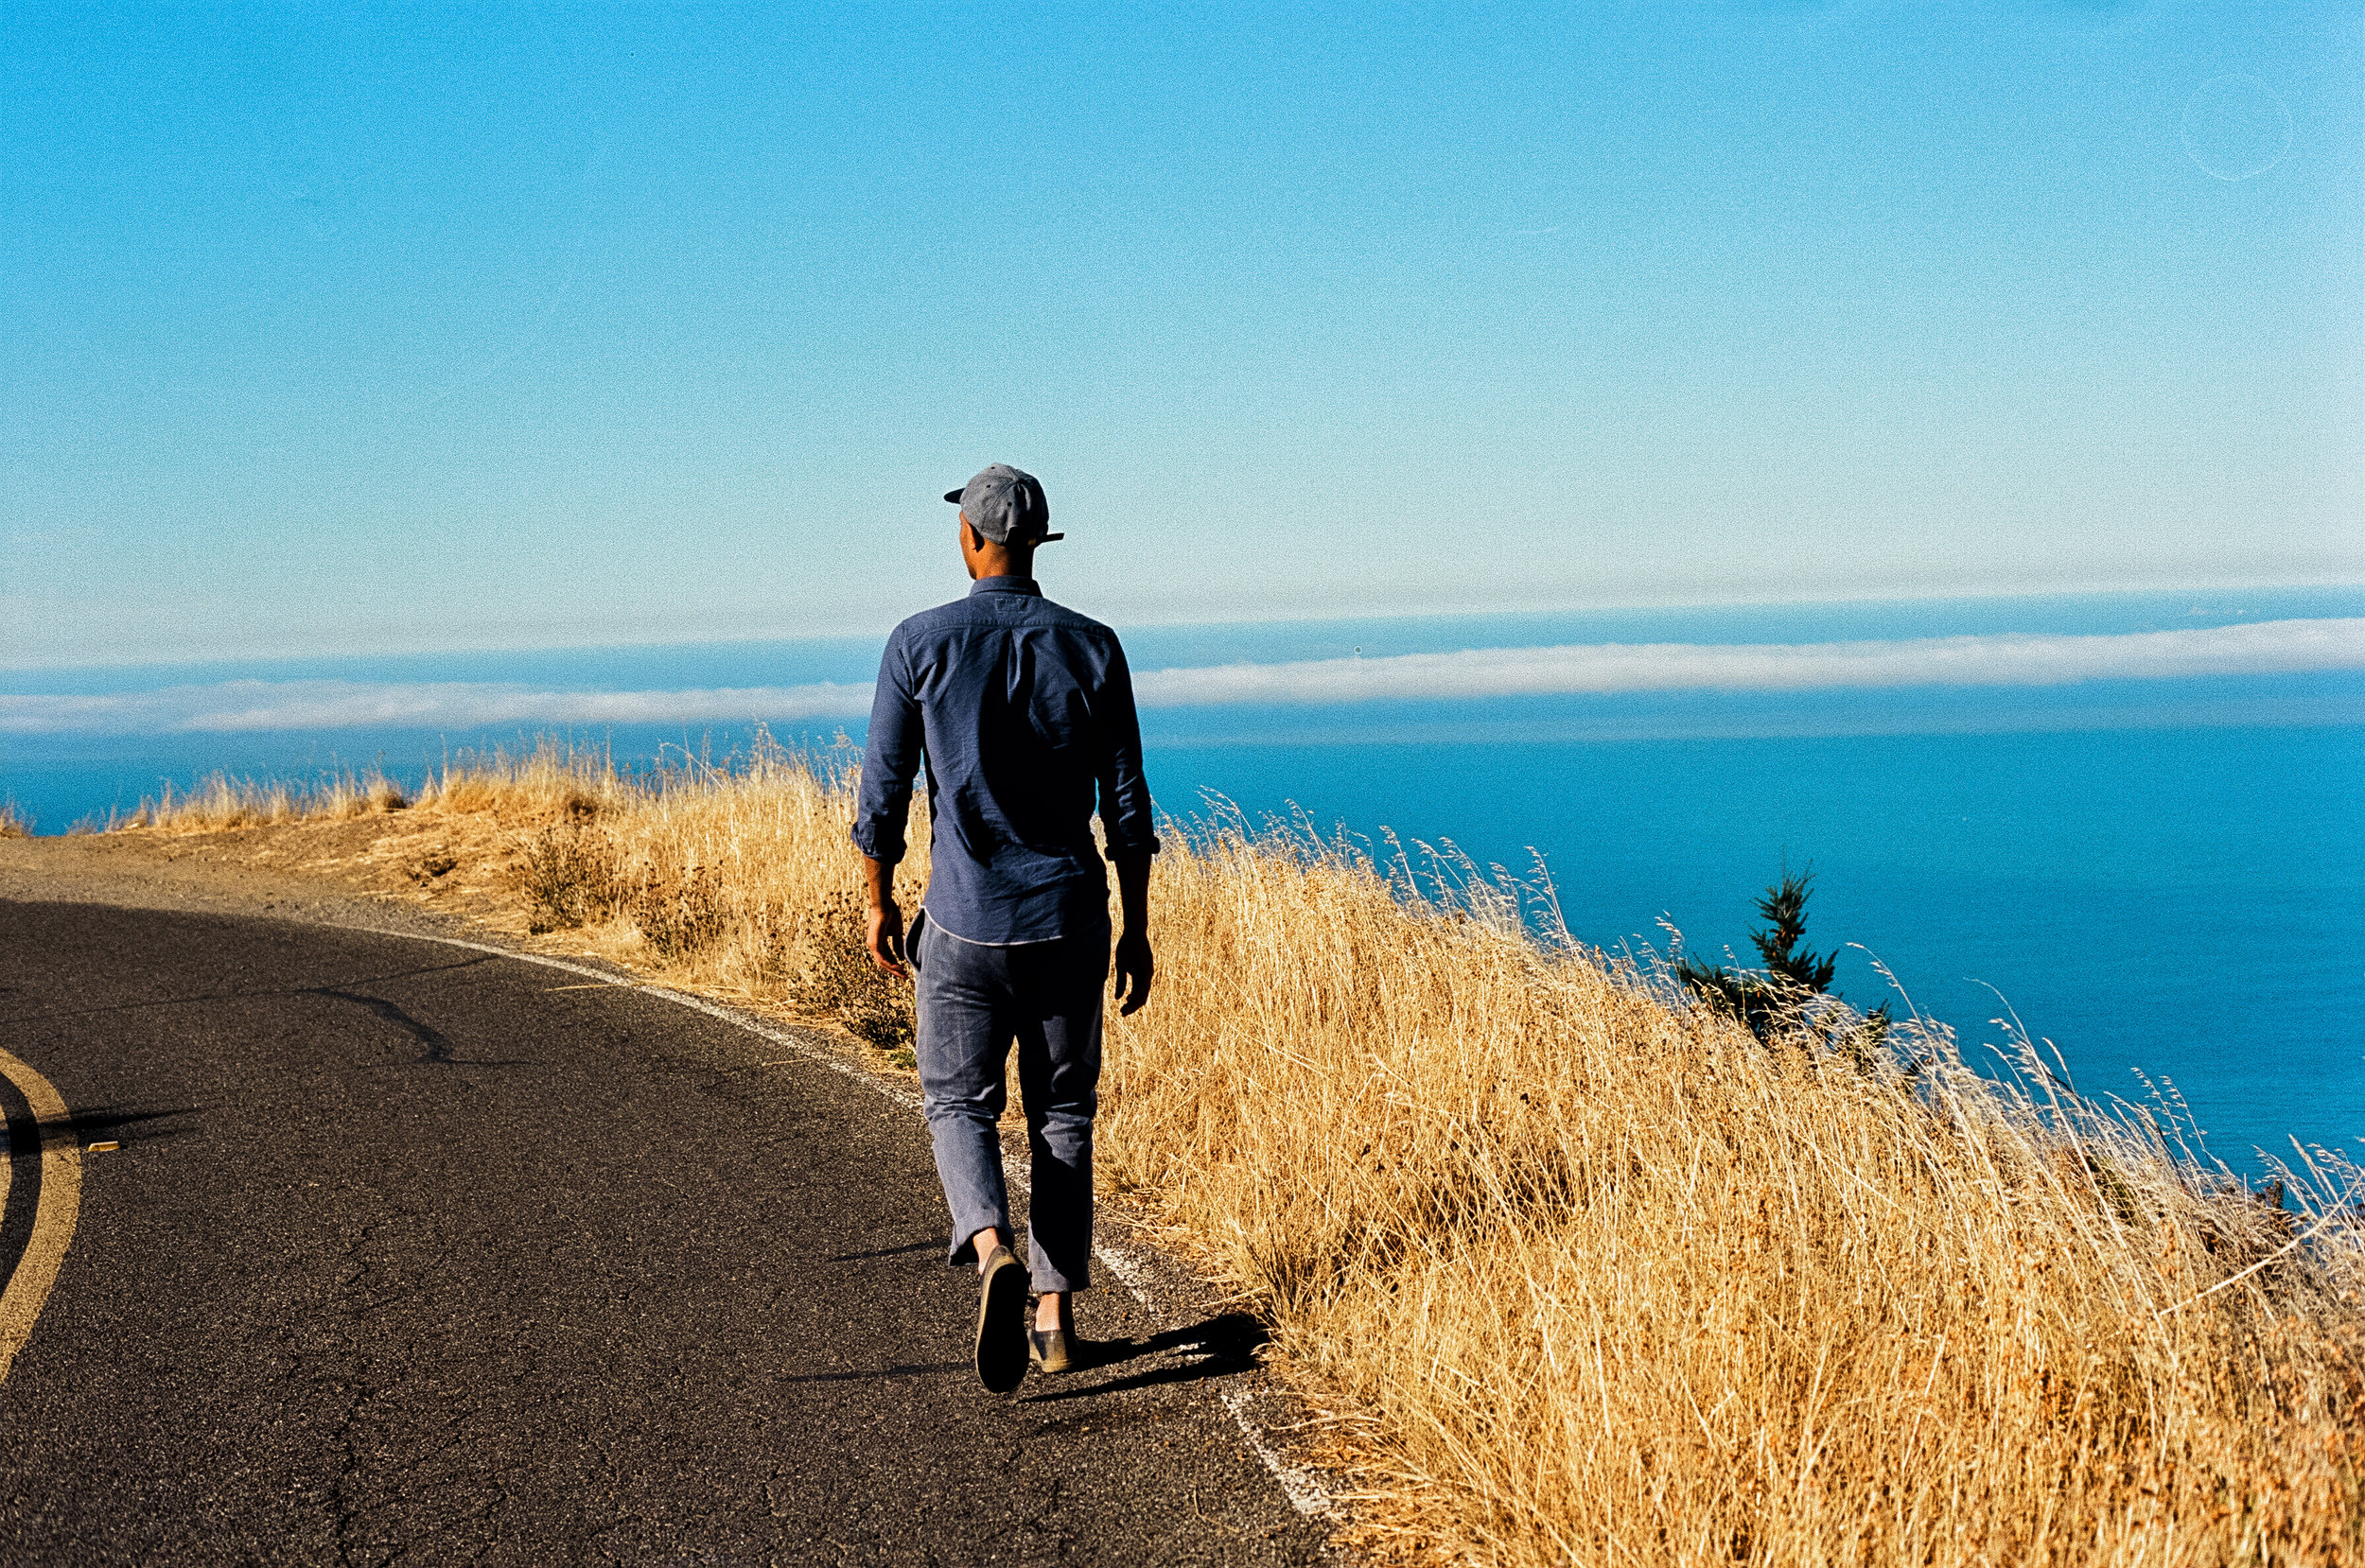 Mount_tamalpais_ocean_view